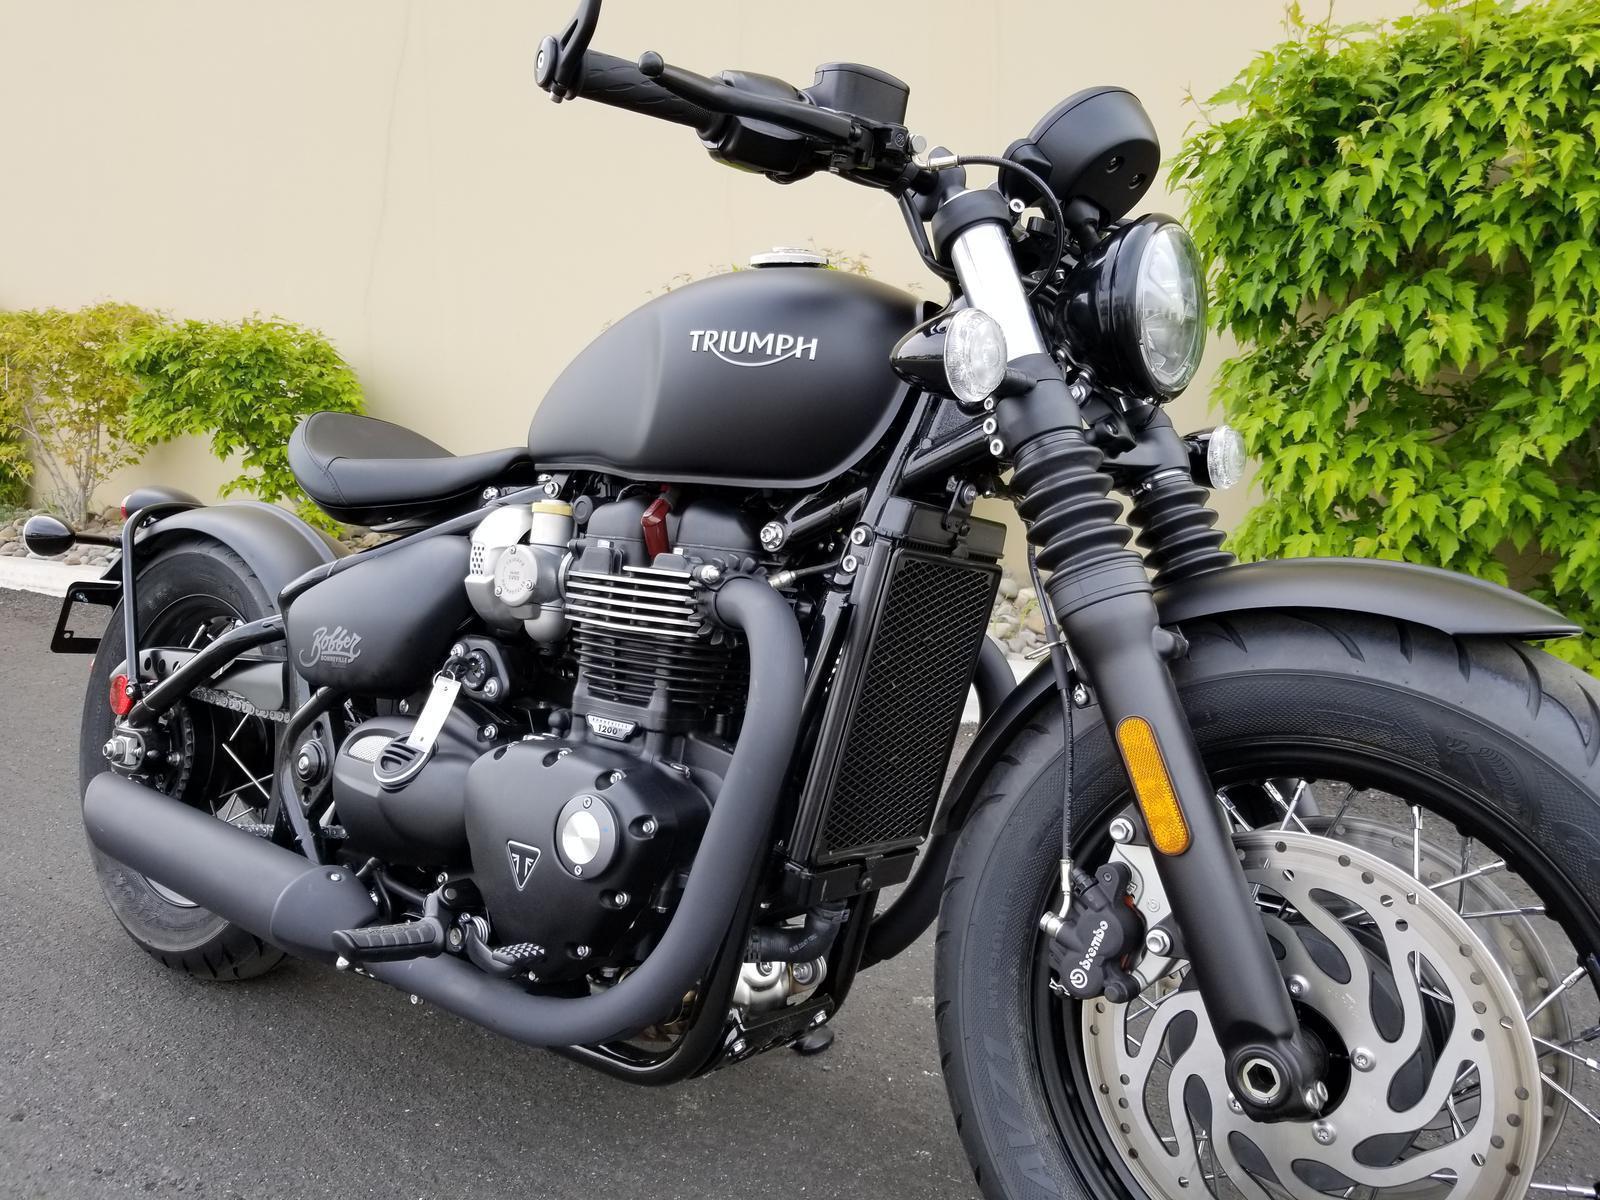 2018 Triumph Bonneville Bobber Black Matte For Sale In Reno Nv